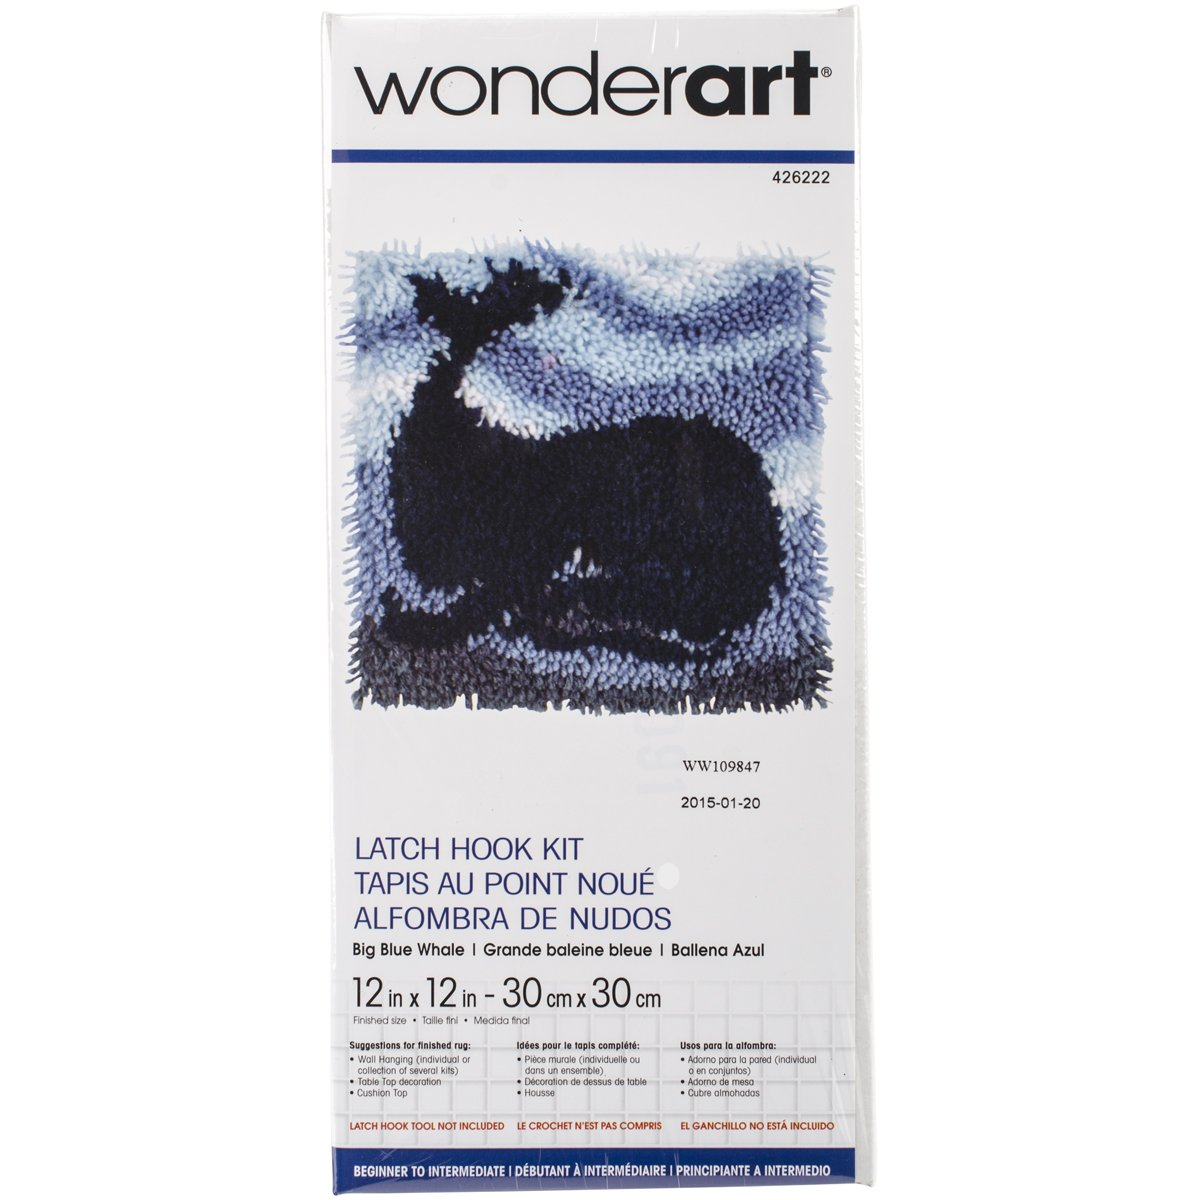 Wonderart Angel Fish Latch Hook Kit 12 X 12